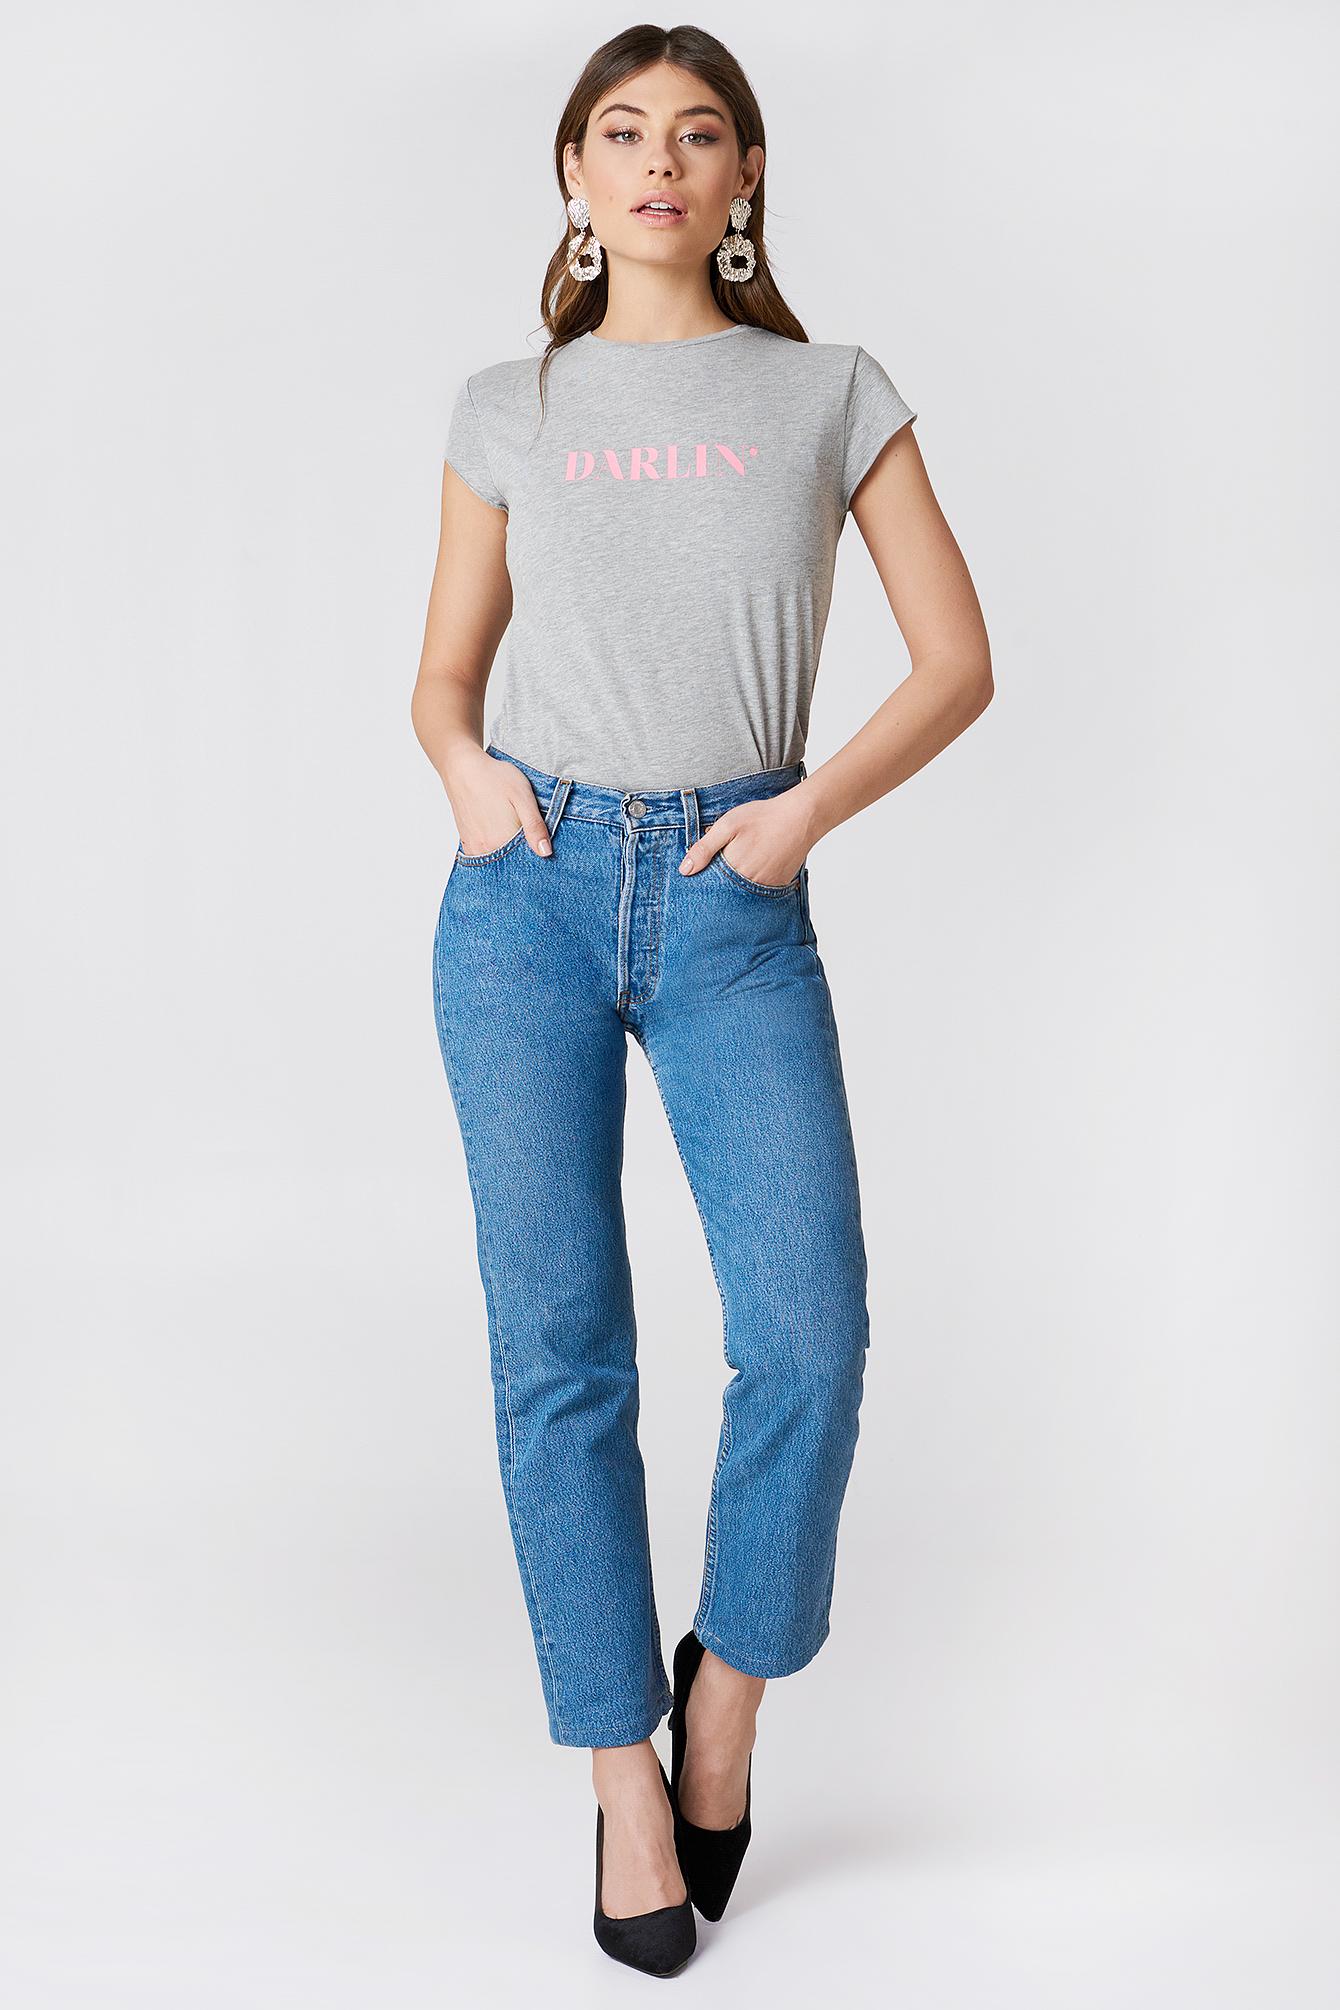 T-shirt Darlin' NA-KD.COM